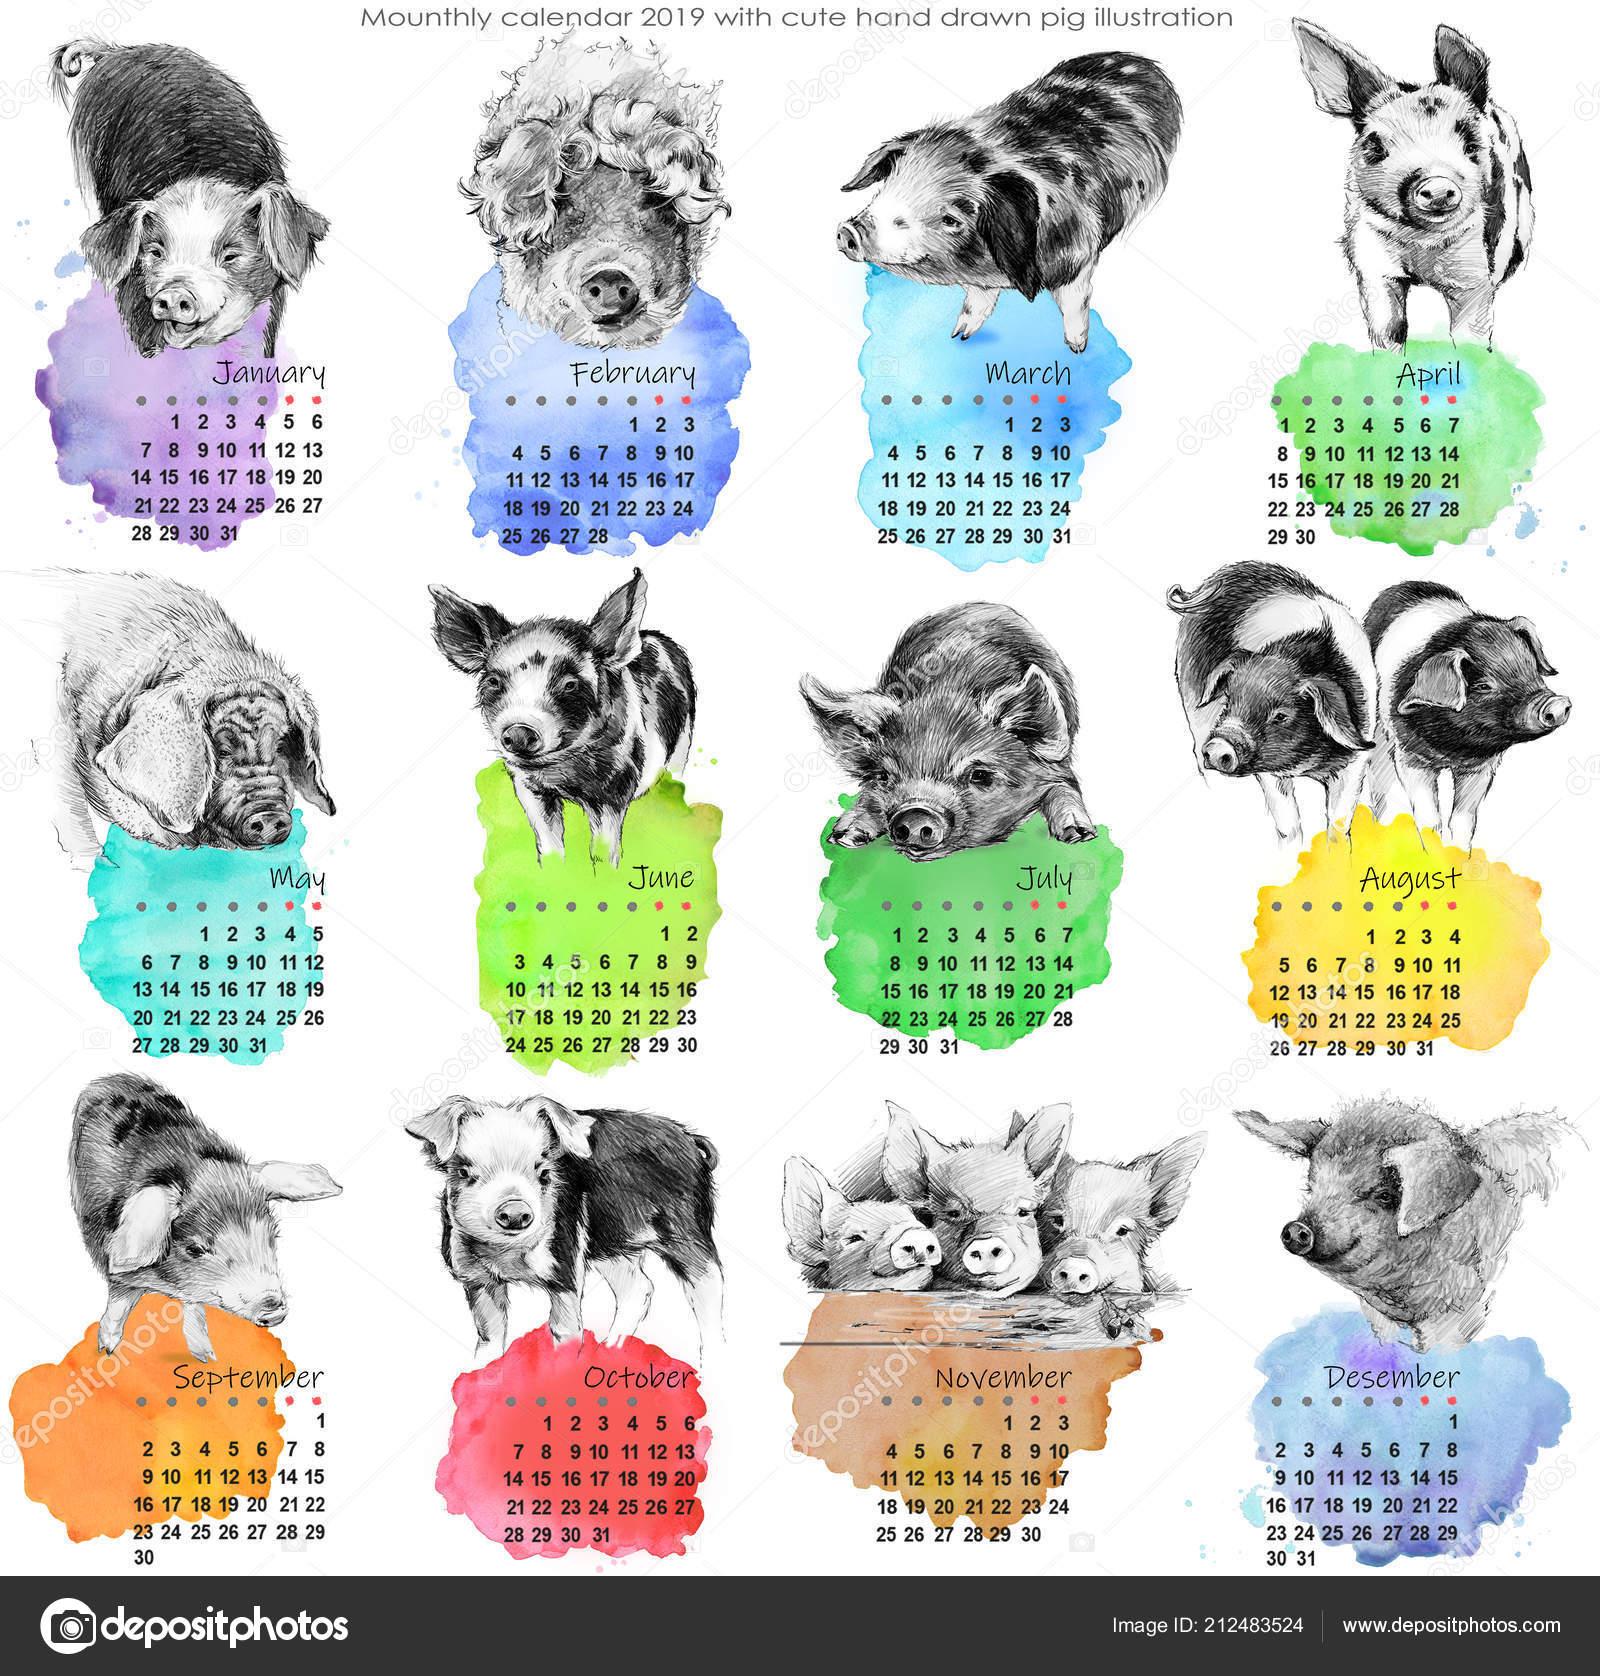 Calendario 2019 Lindo Calendario Mensual Con Ilustración Lindos